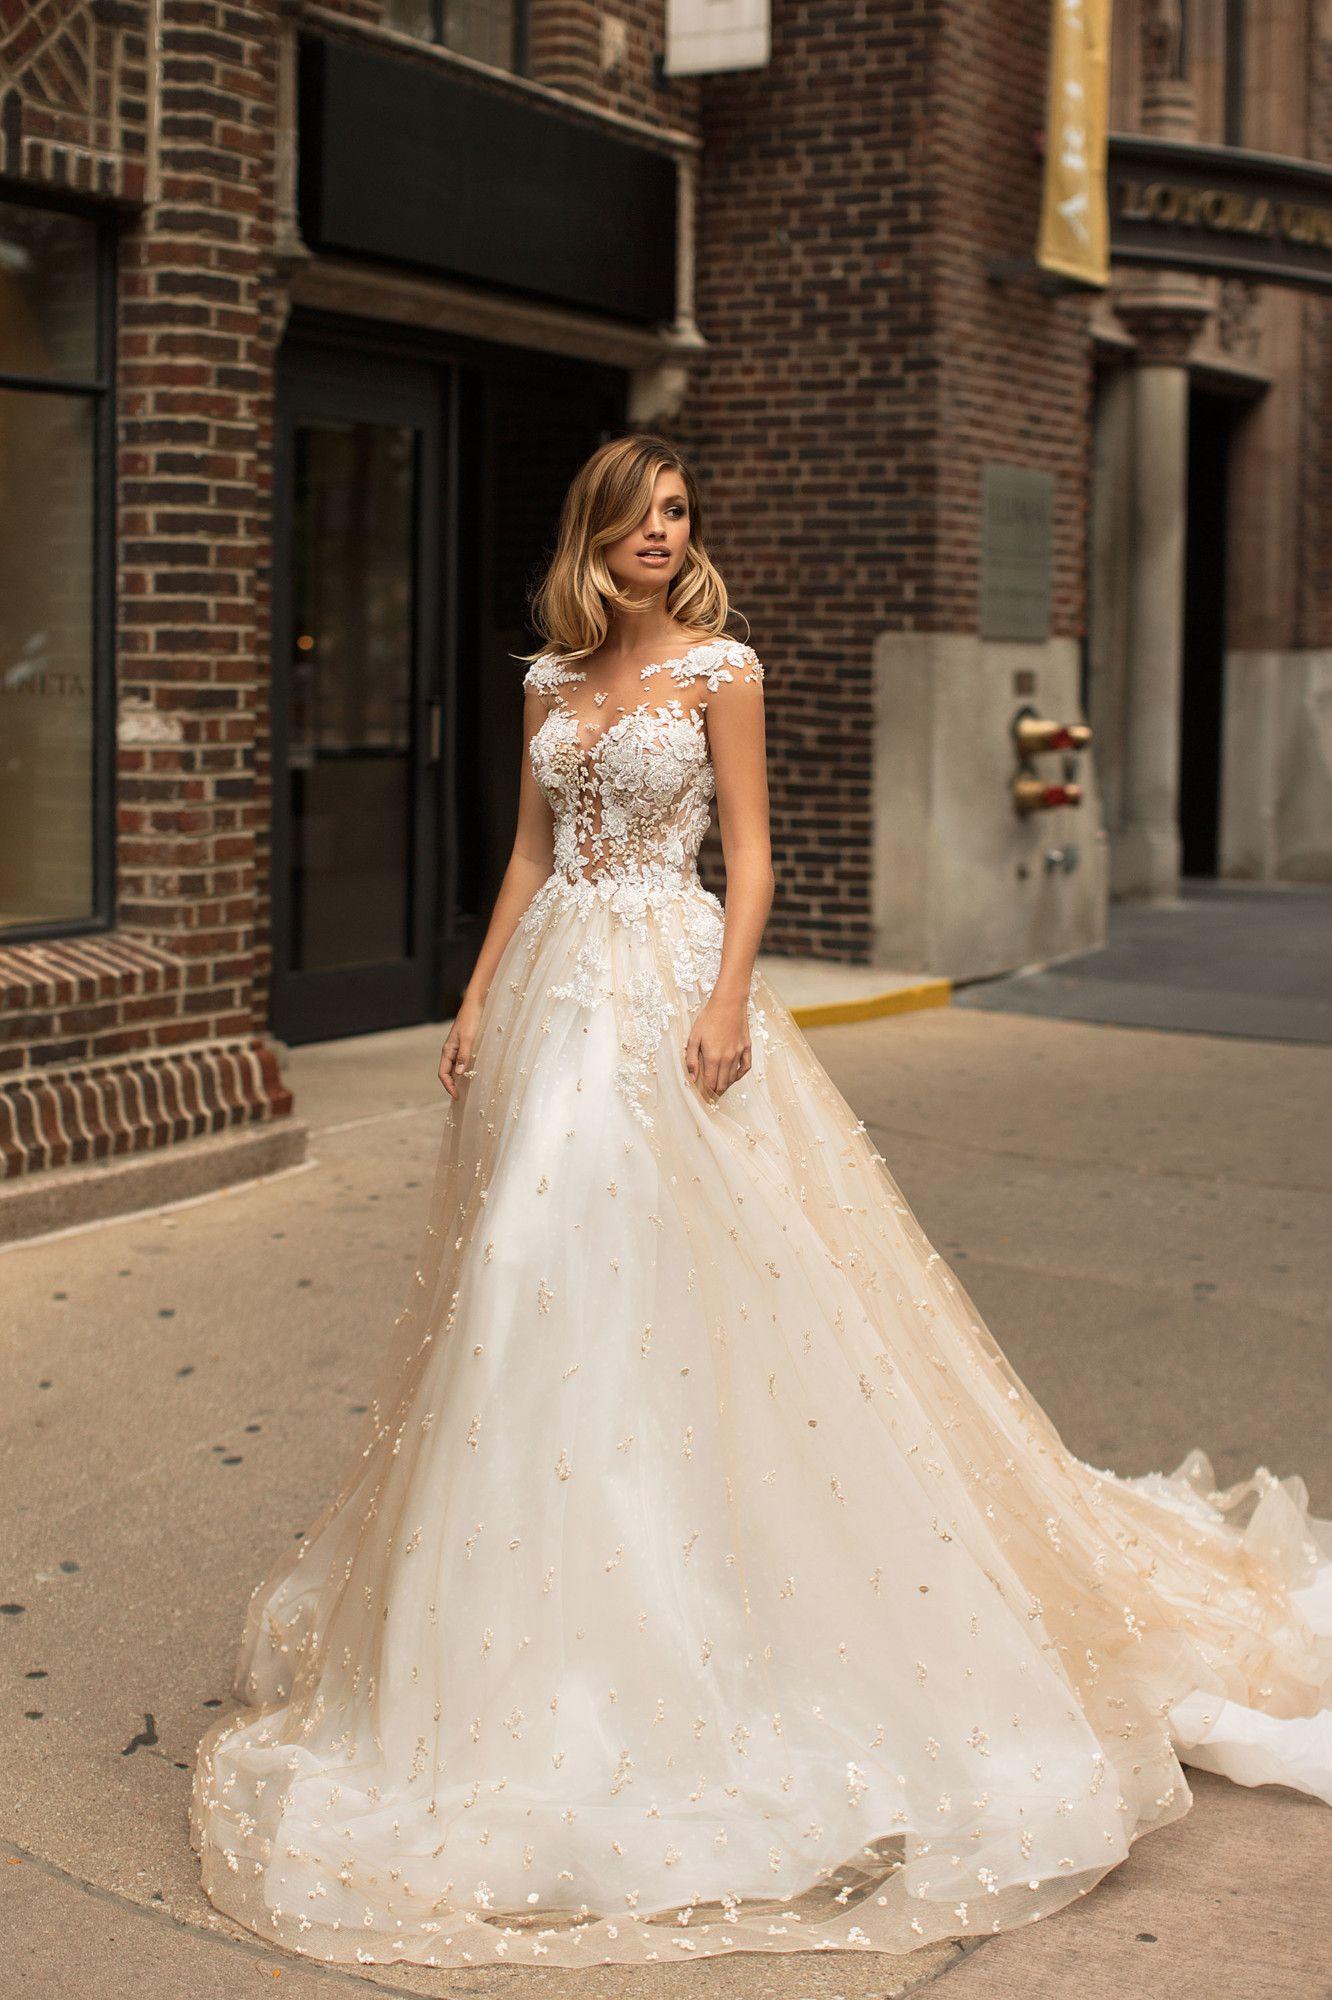 Sebsuella1 Bridal Gowns Vintage Pink Wedding Dresses Bridal Gowns [ 2000 x 1332 Pixel ]